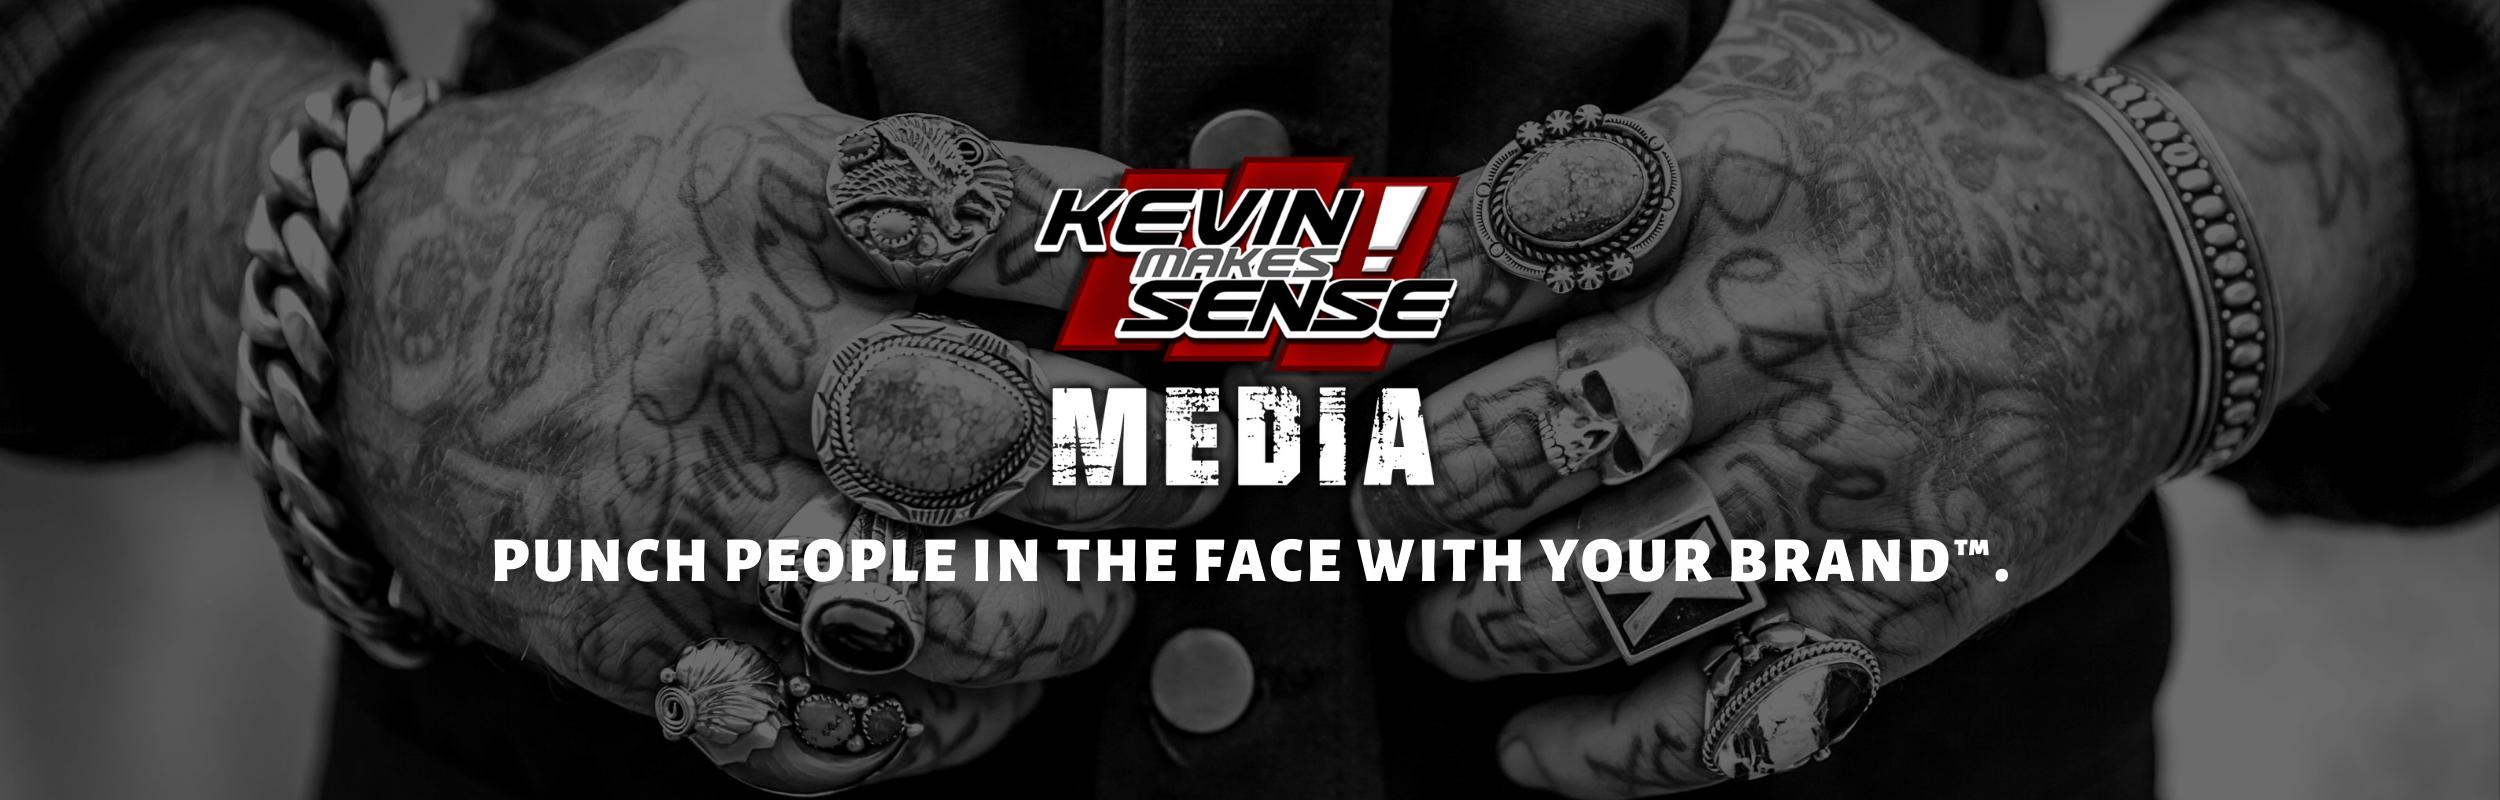 Kevin Makes Sense Media